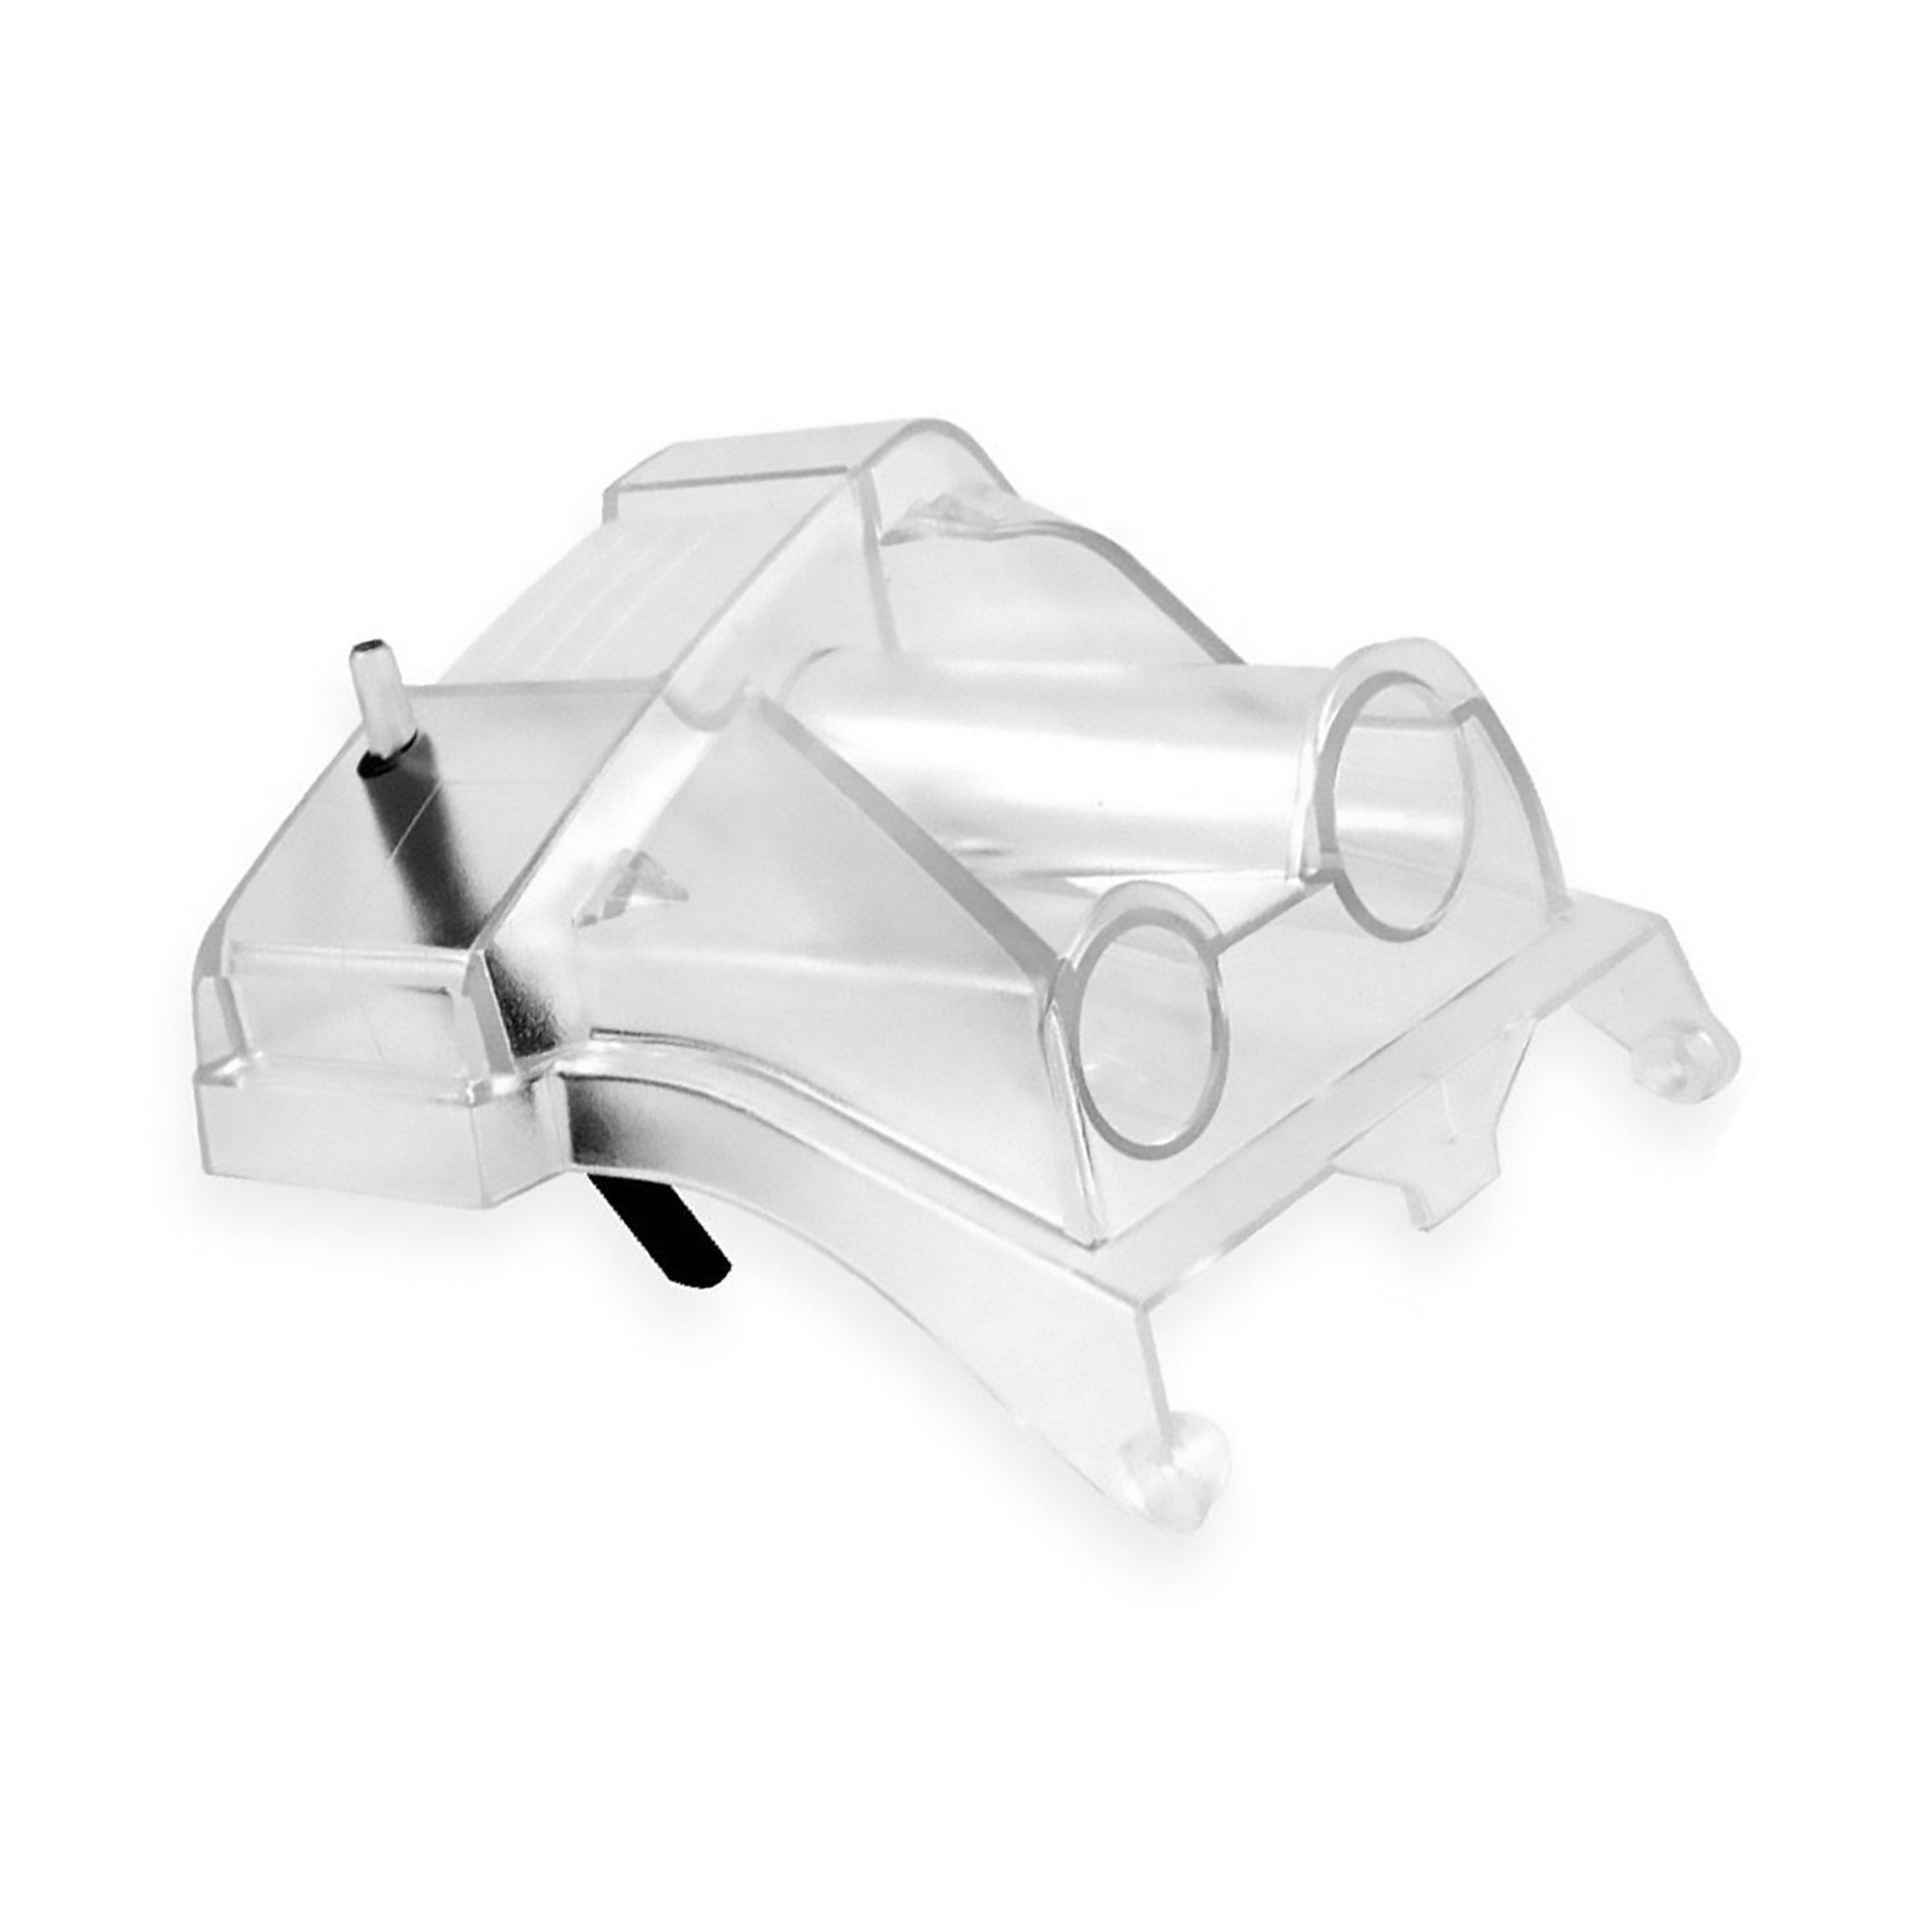 SoClean CPAP Cleaning Machine Adapter, PNA1210UNI, 1 Each